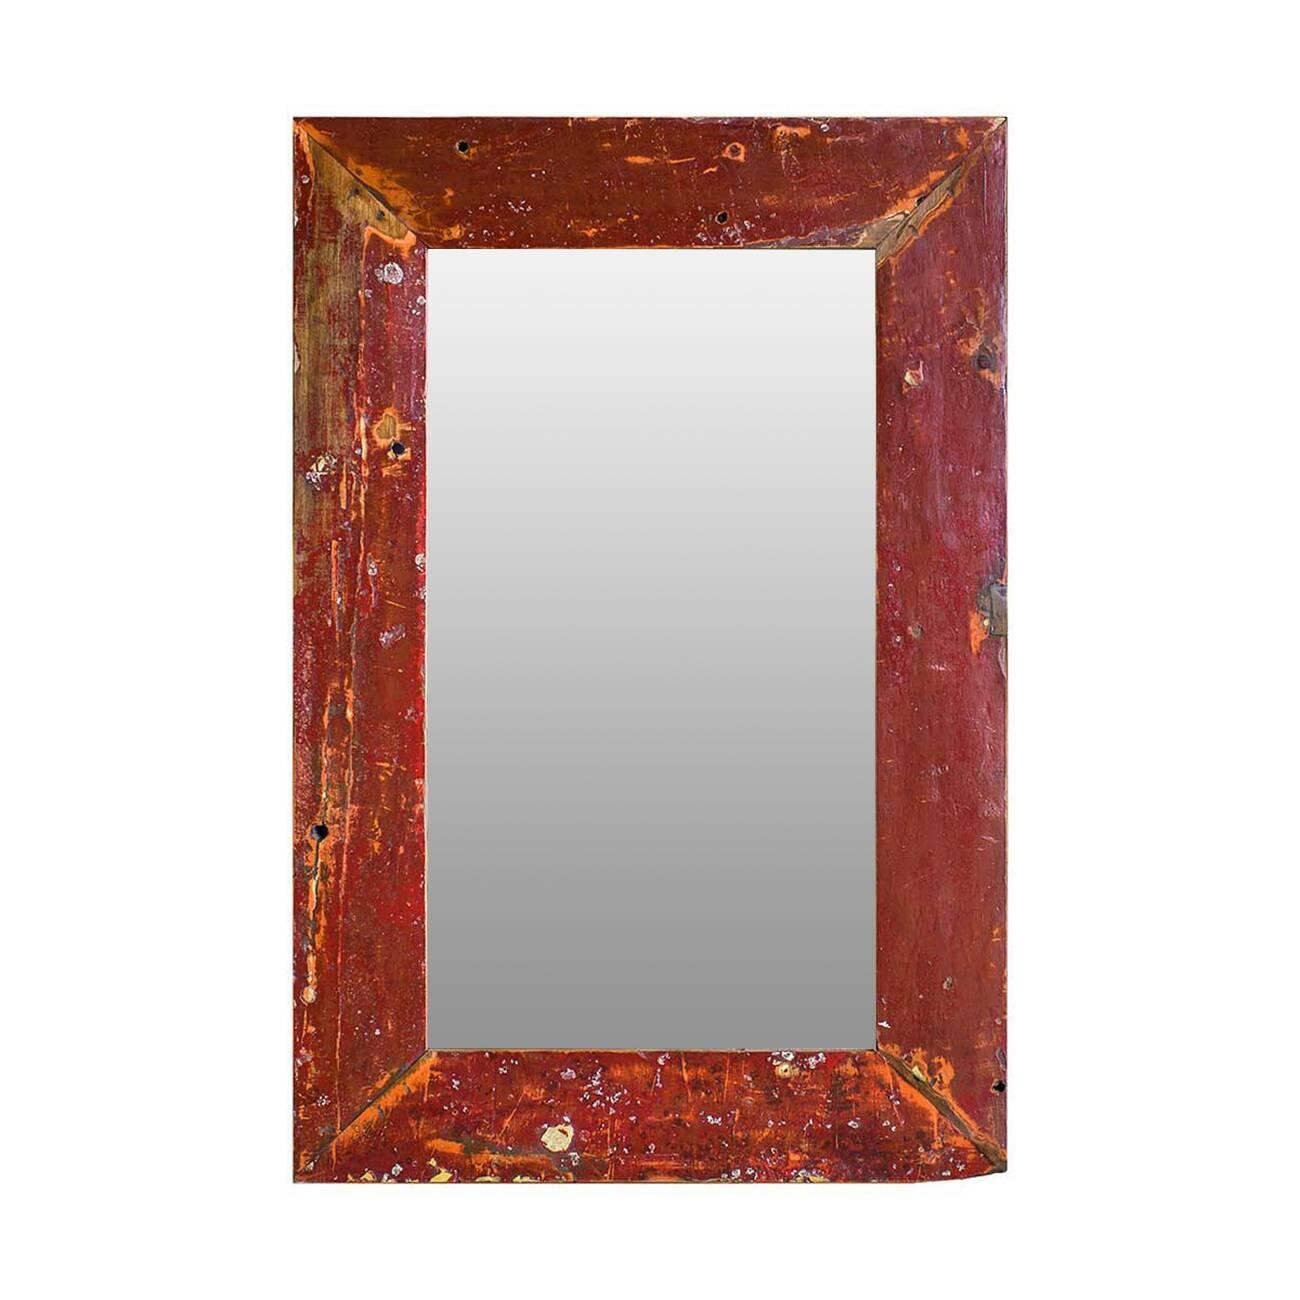 Зеркало Like Lodka 15578229 от Cosmorelax